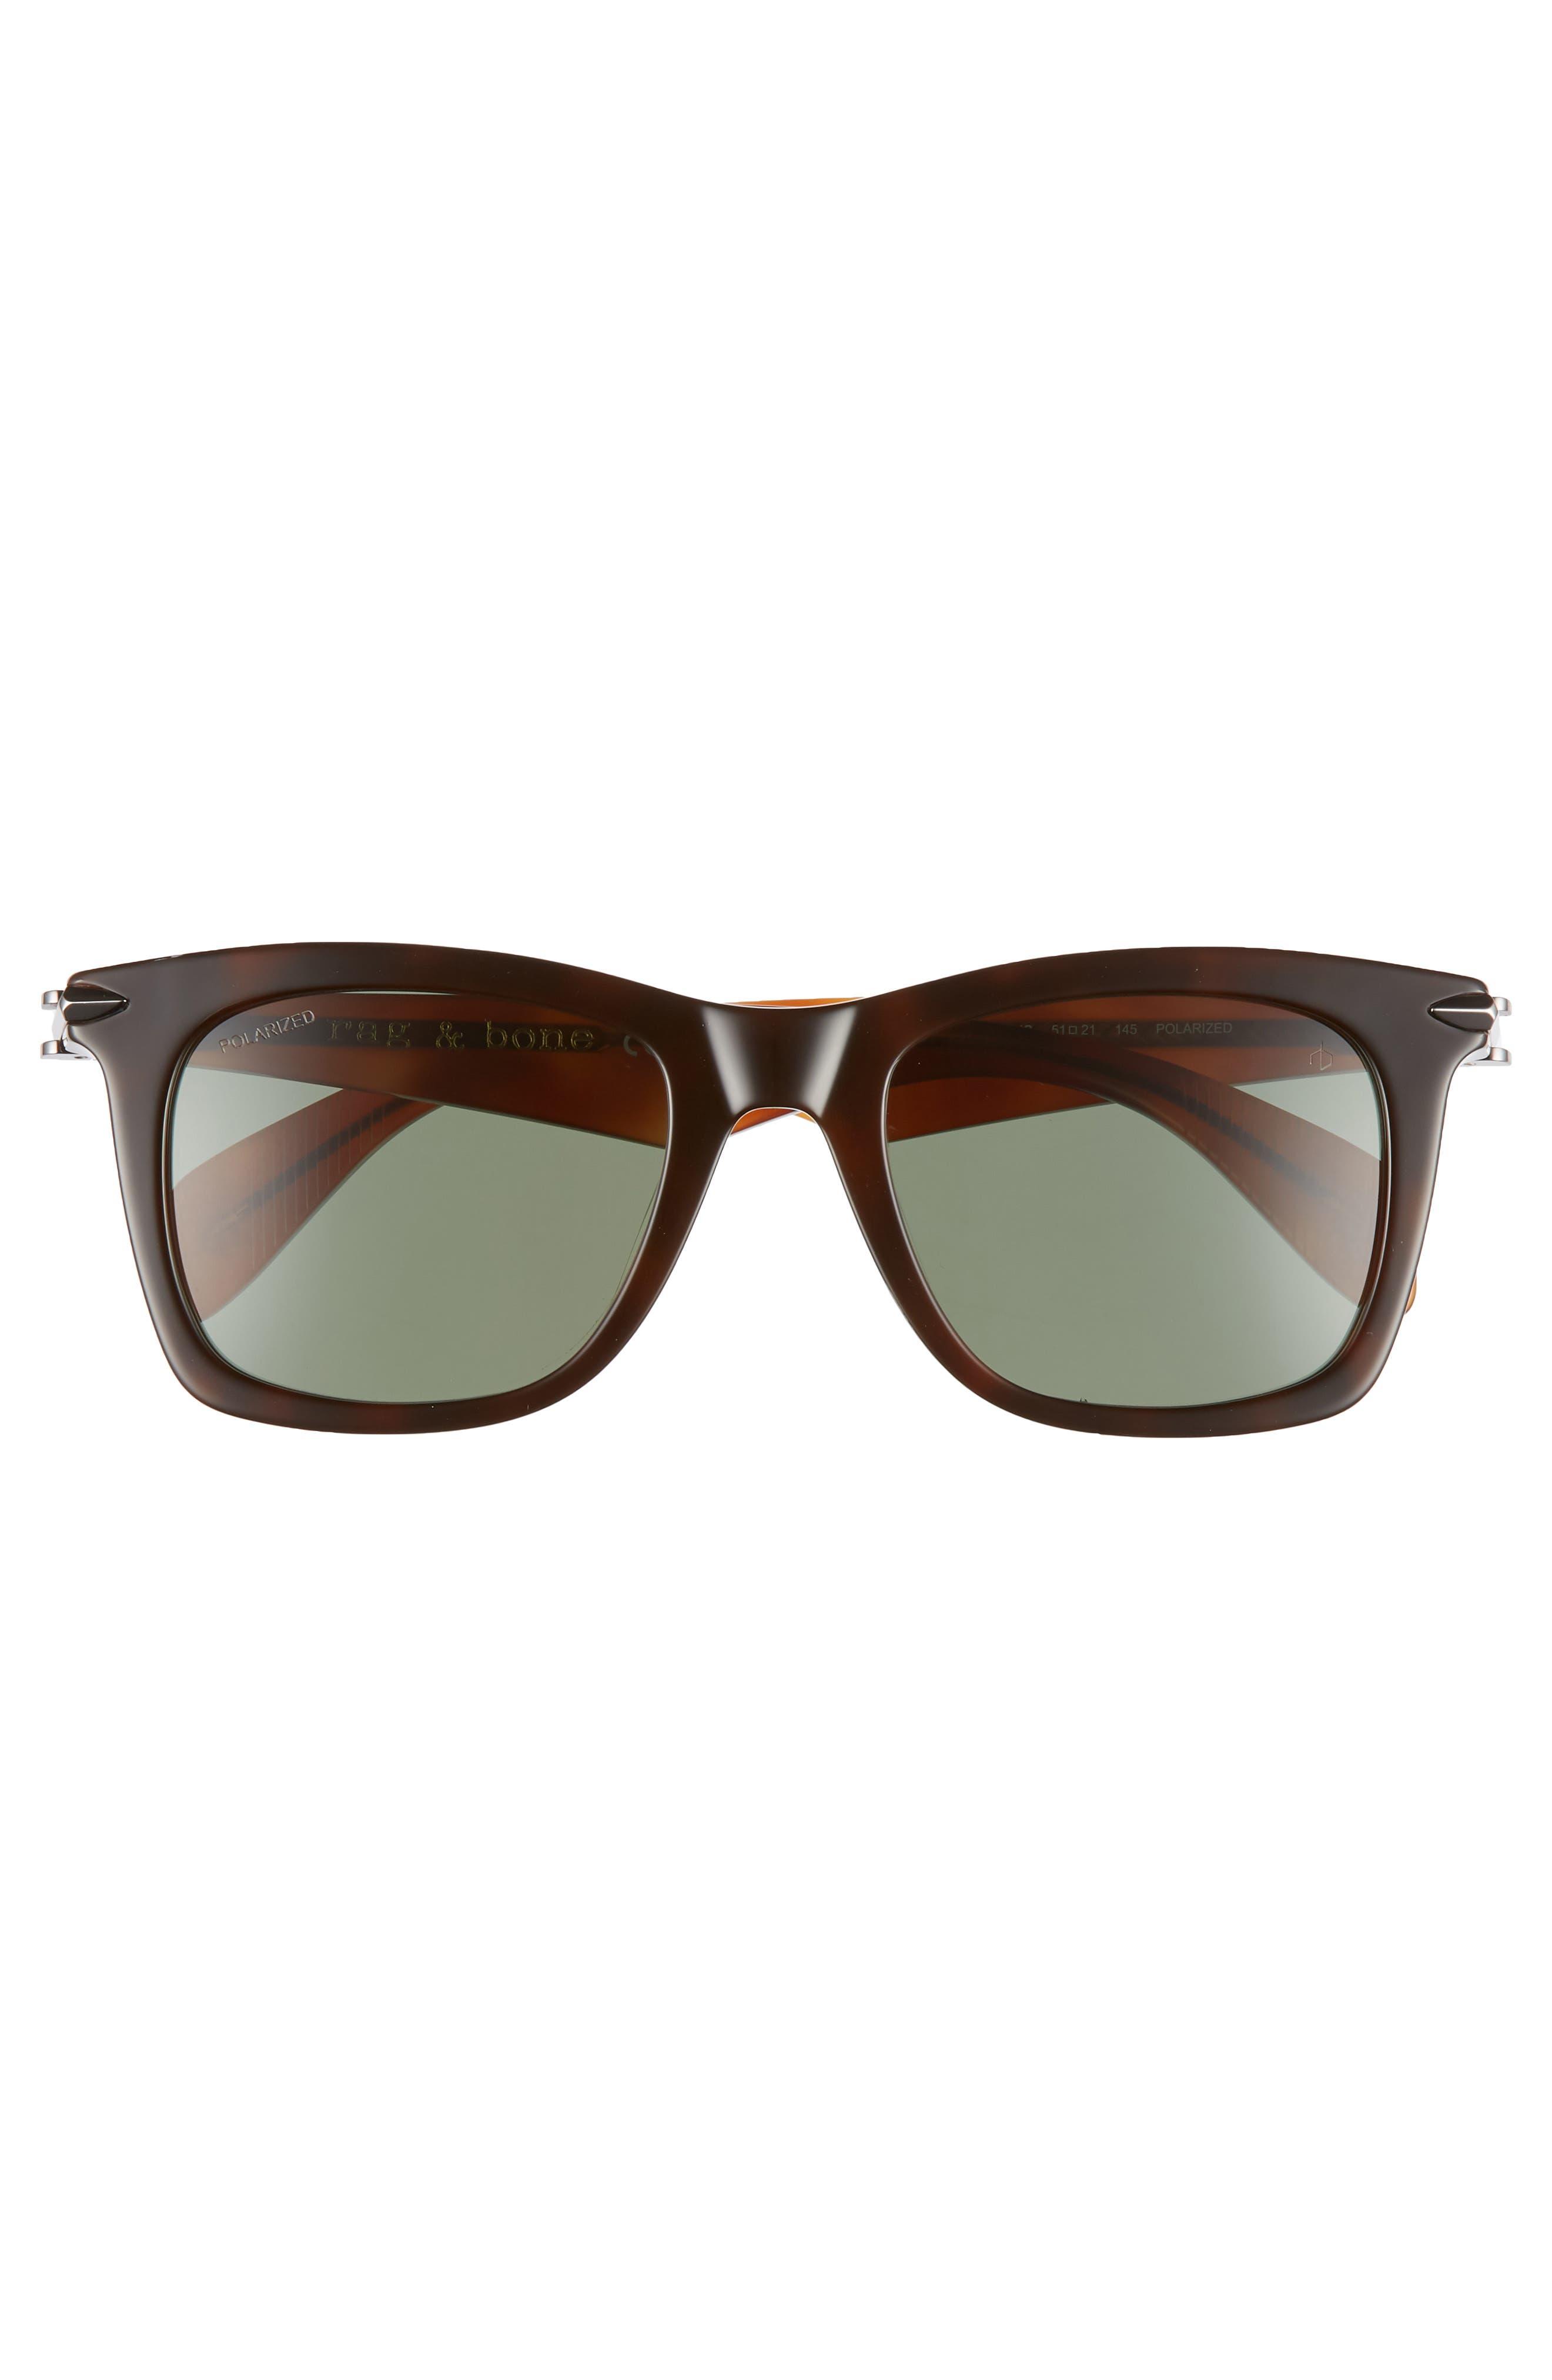 Core 51mm Polarized Sunglasses,                             Alternate thumbnail 3, color,                             DARK/ HAVANA